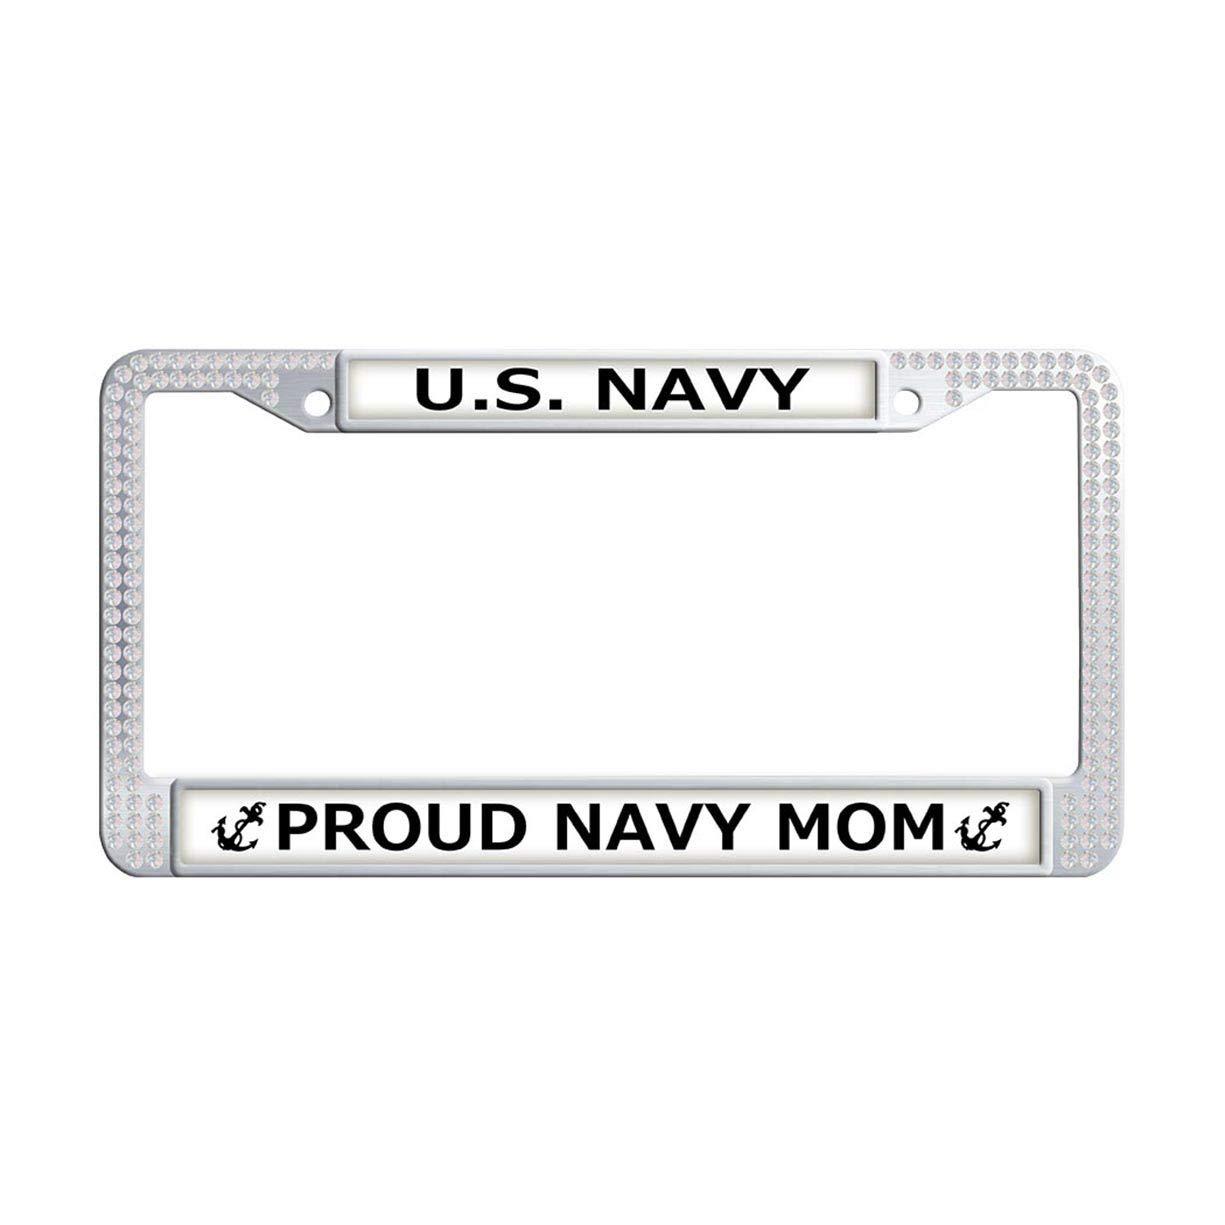 12a7e205cbd6 Amazon.com  FukongCase U.S. Navy Proud Navy MOM License Plate Frame ...